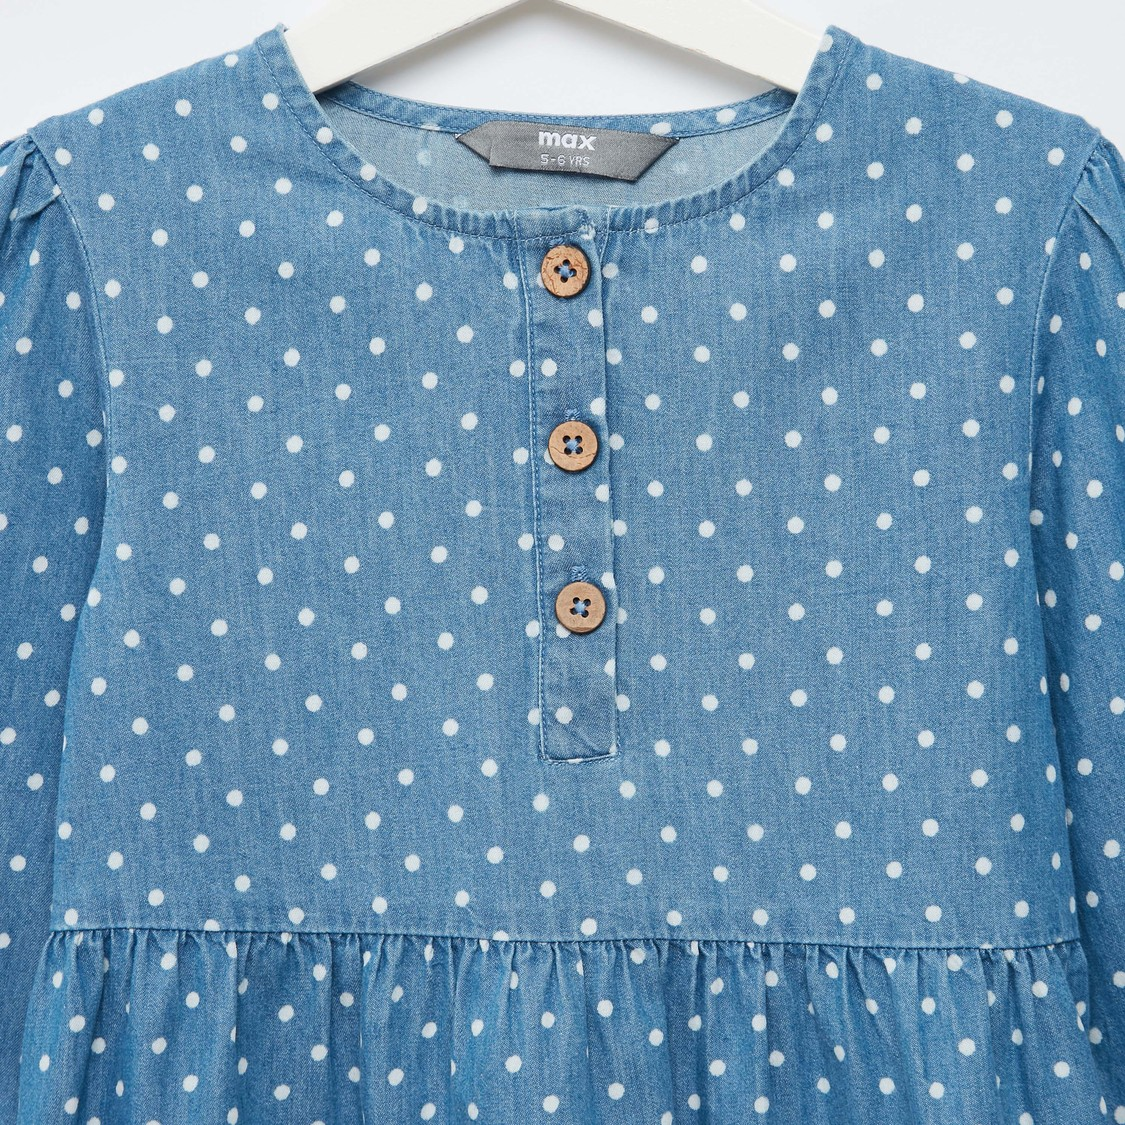 Polka Dots Print Chambray Tiered Dress with Long Sleeves